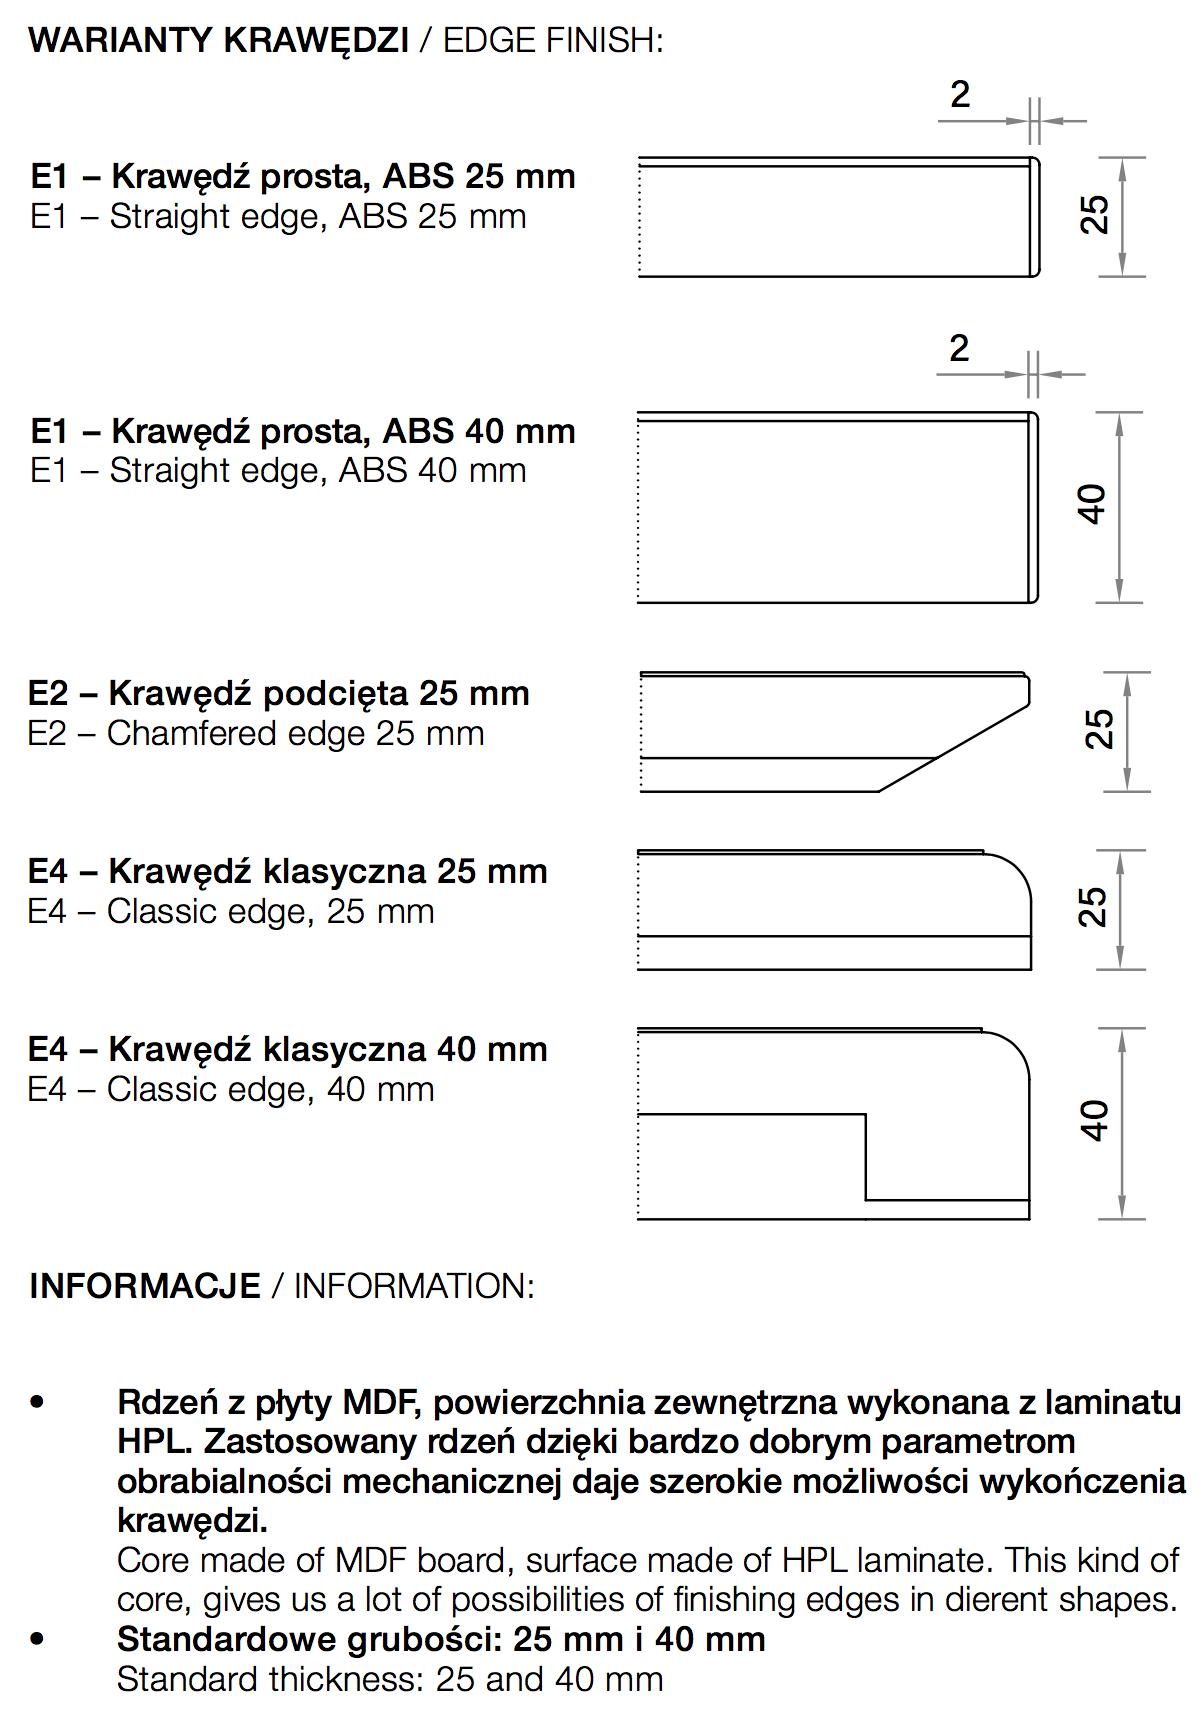 Blat TLM - PŁYTA MDF LAMINOWANA HPL - Meblesklep.pl